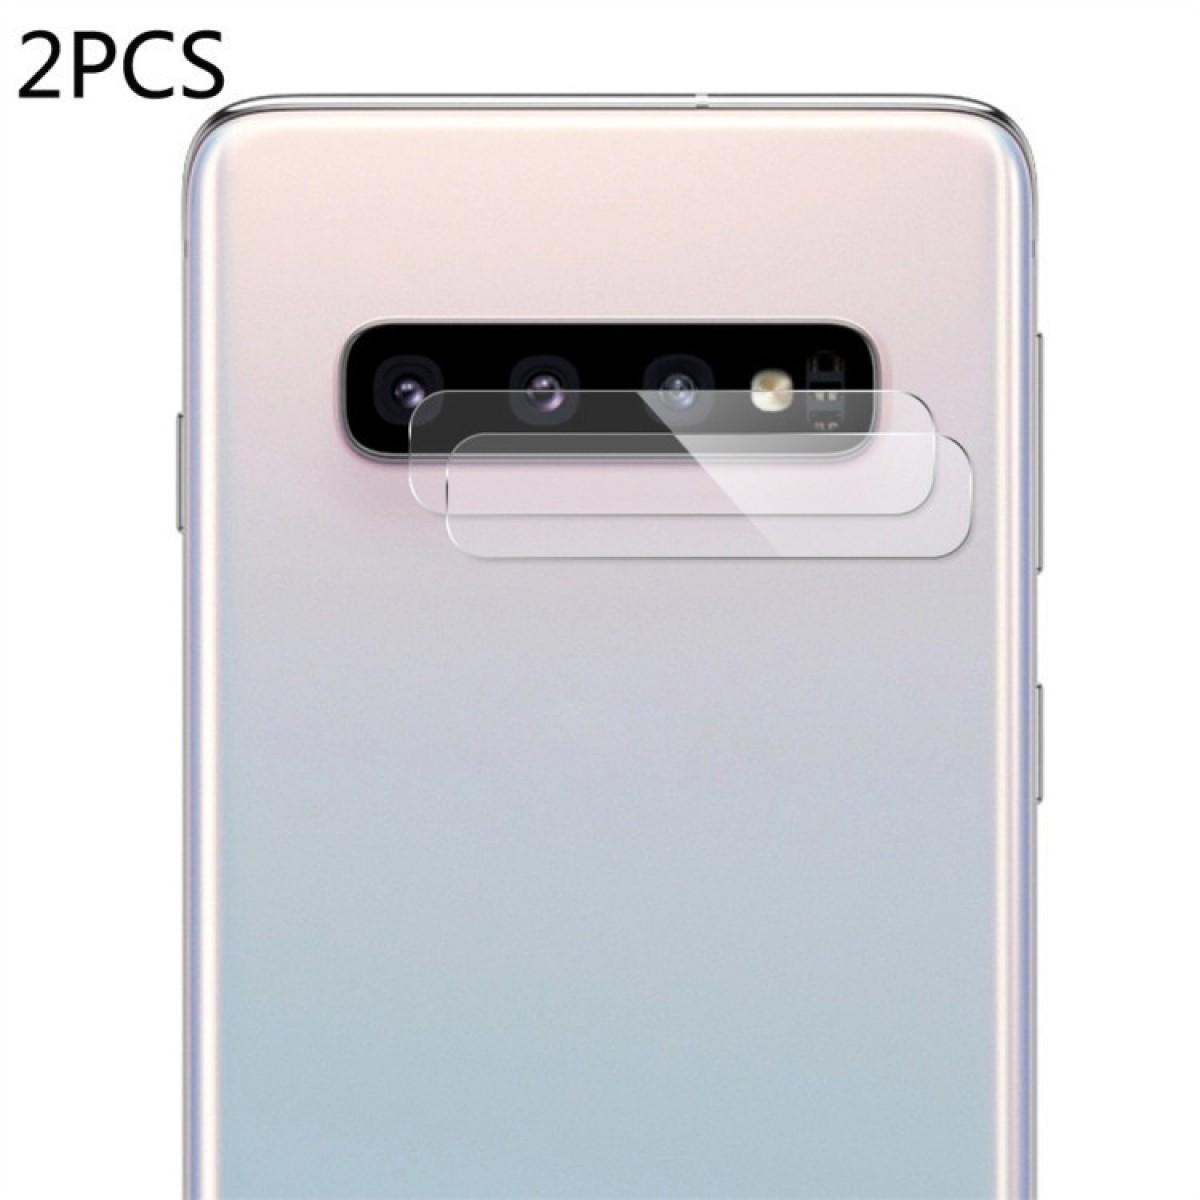 Защитное стекло на камеру ENKAY 0.2mm 9H на Samsung Galaxy S10/ S10 Plus